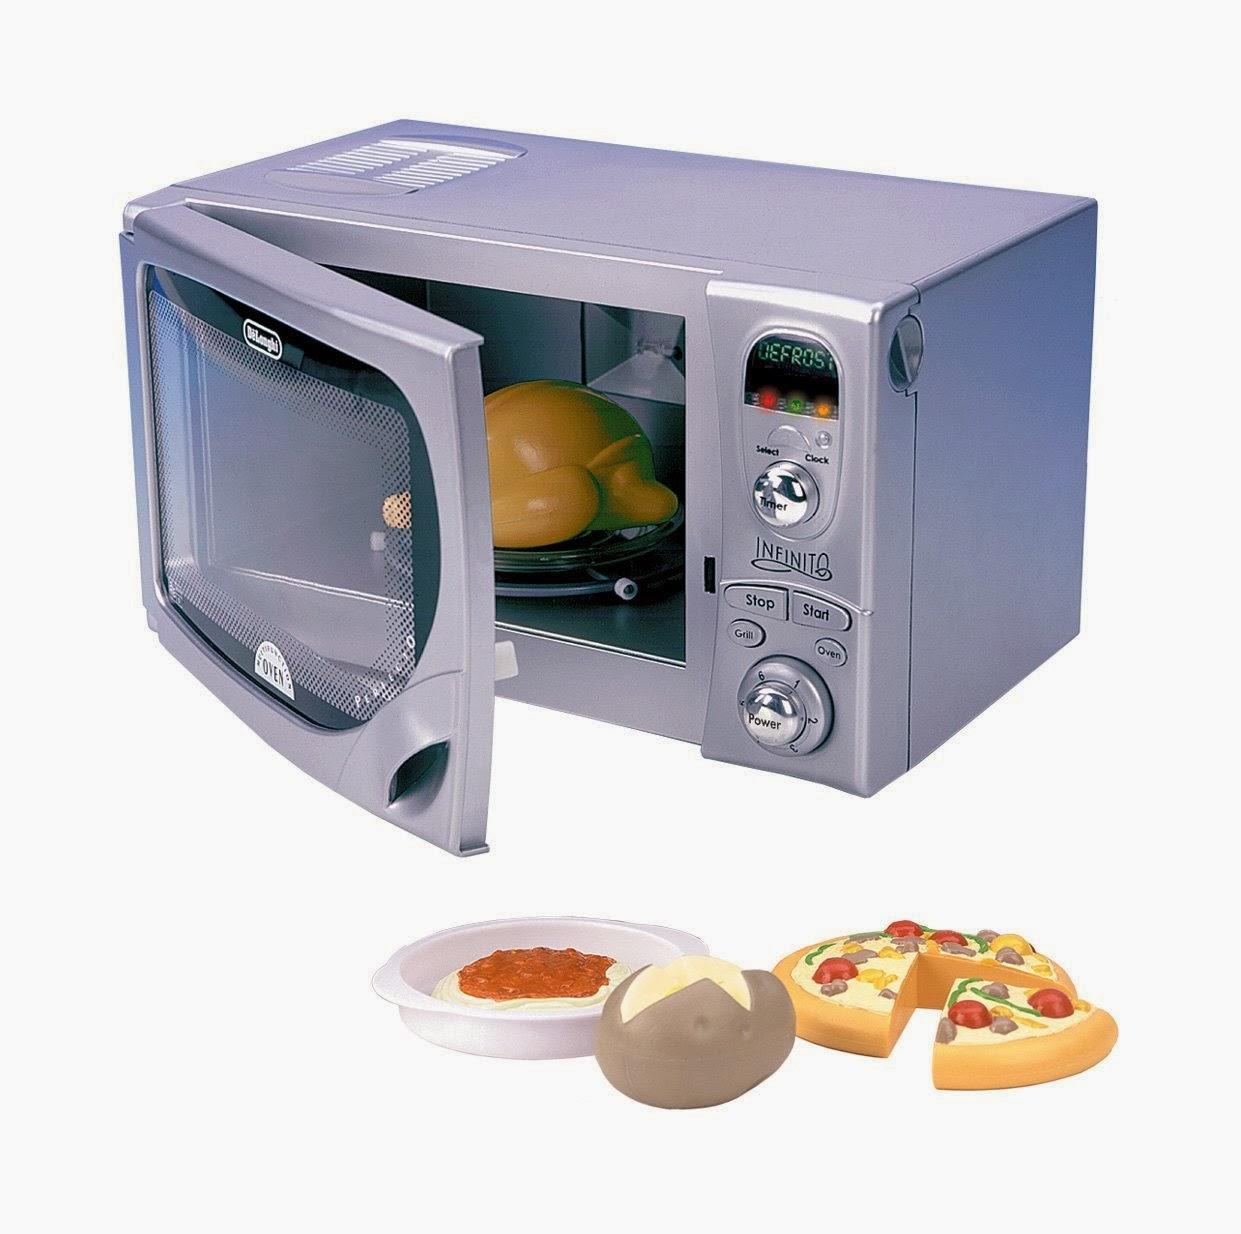 http://www.amazon.com/CASDON-492-Casdon-Electronic-Microwave/dp/B000296LJS